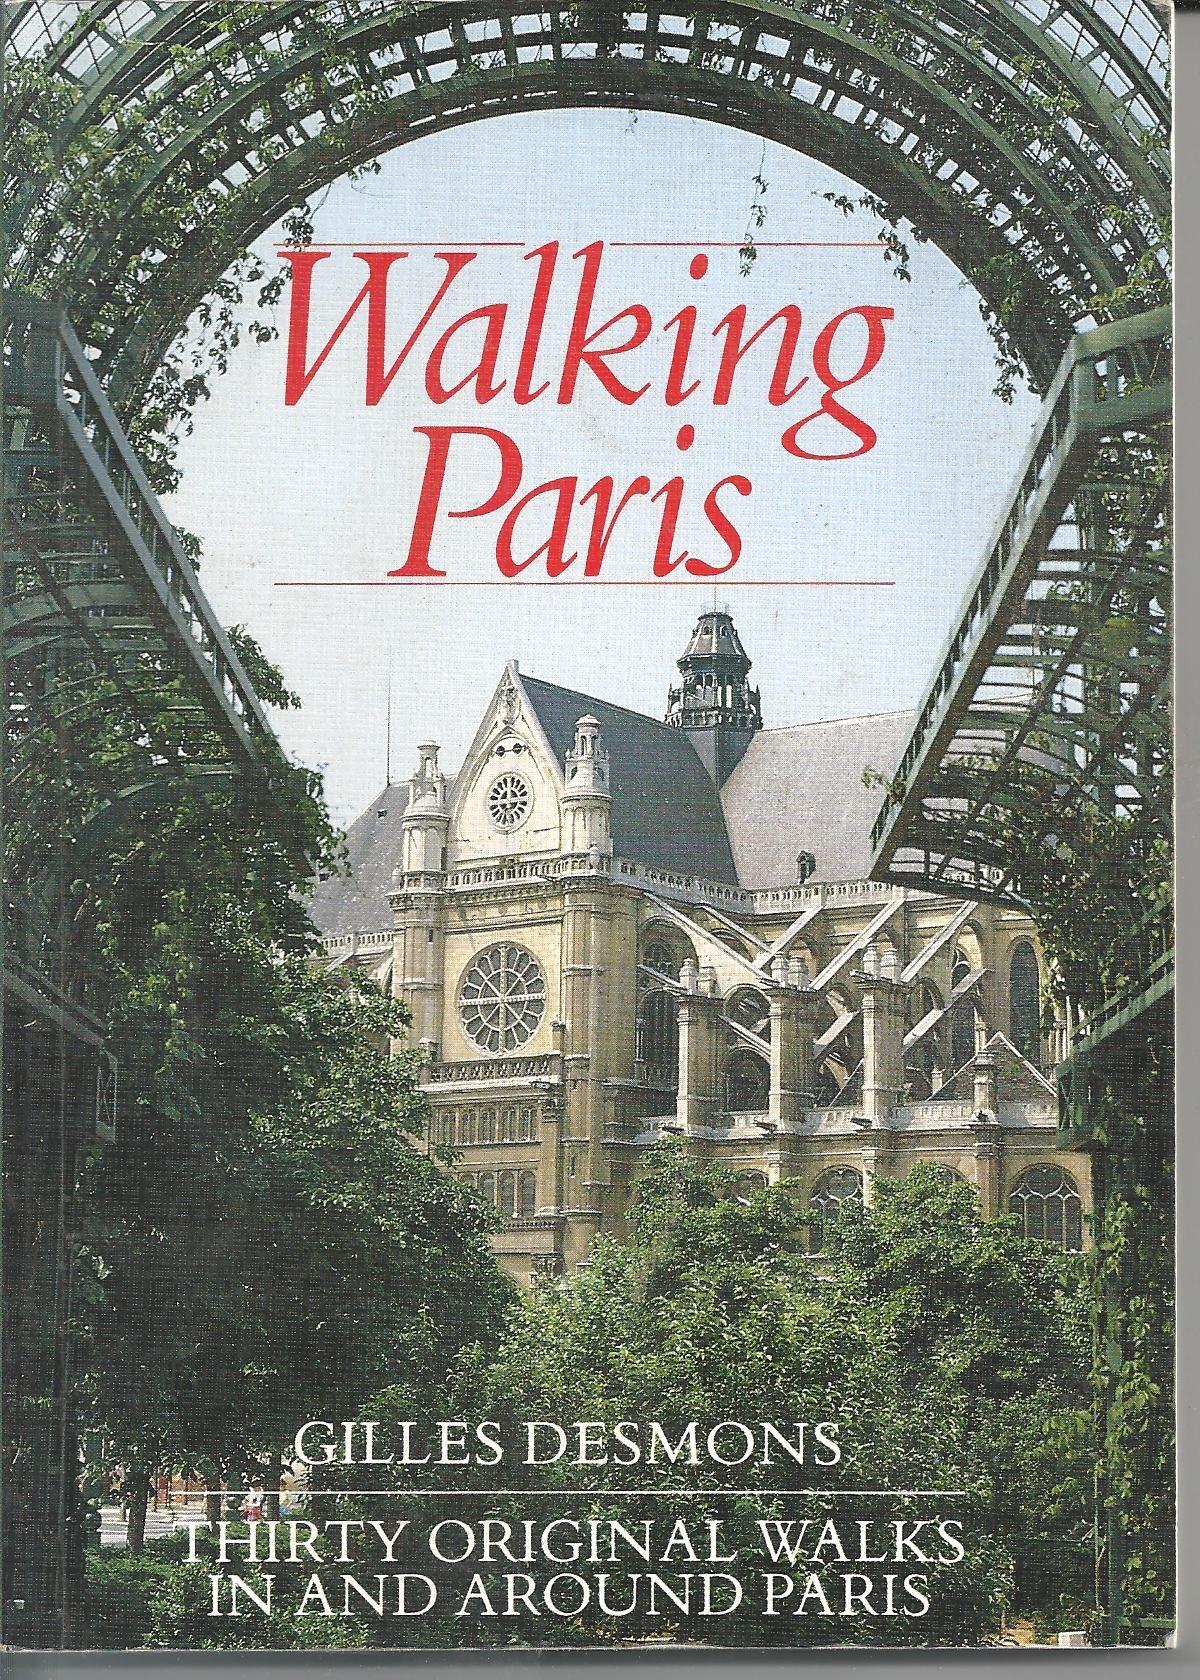 Walking Paris: Thirty Original Walks in and Around Paris